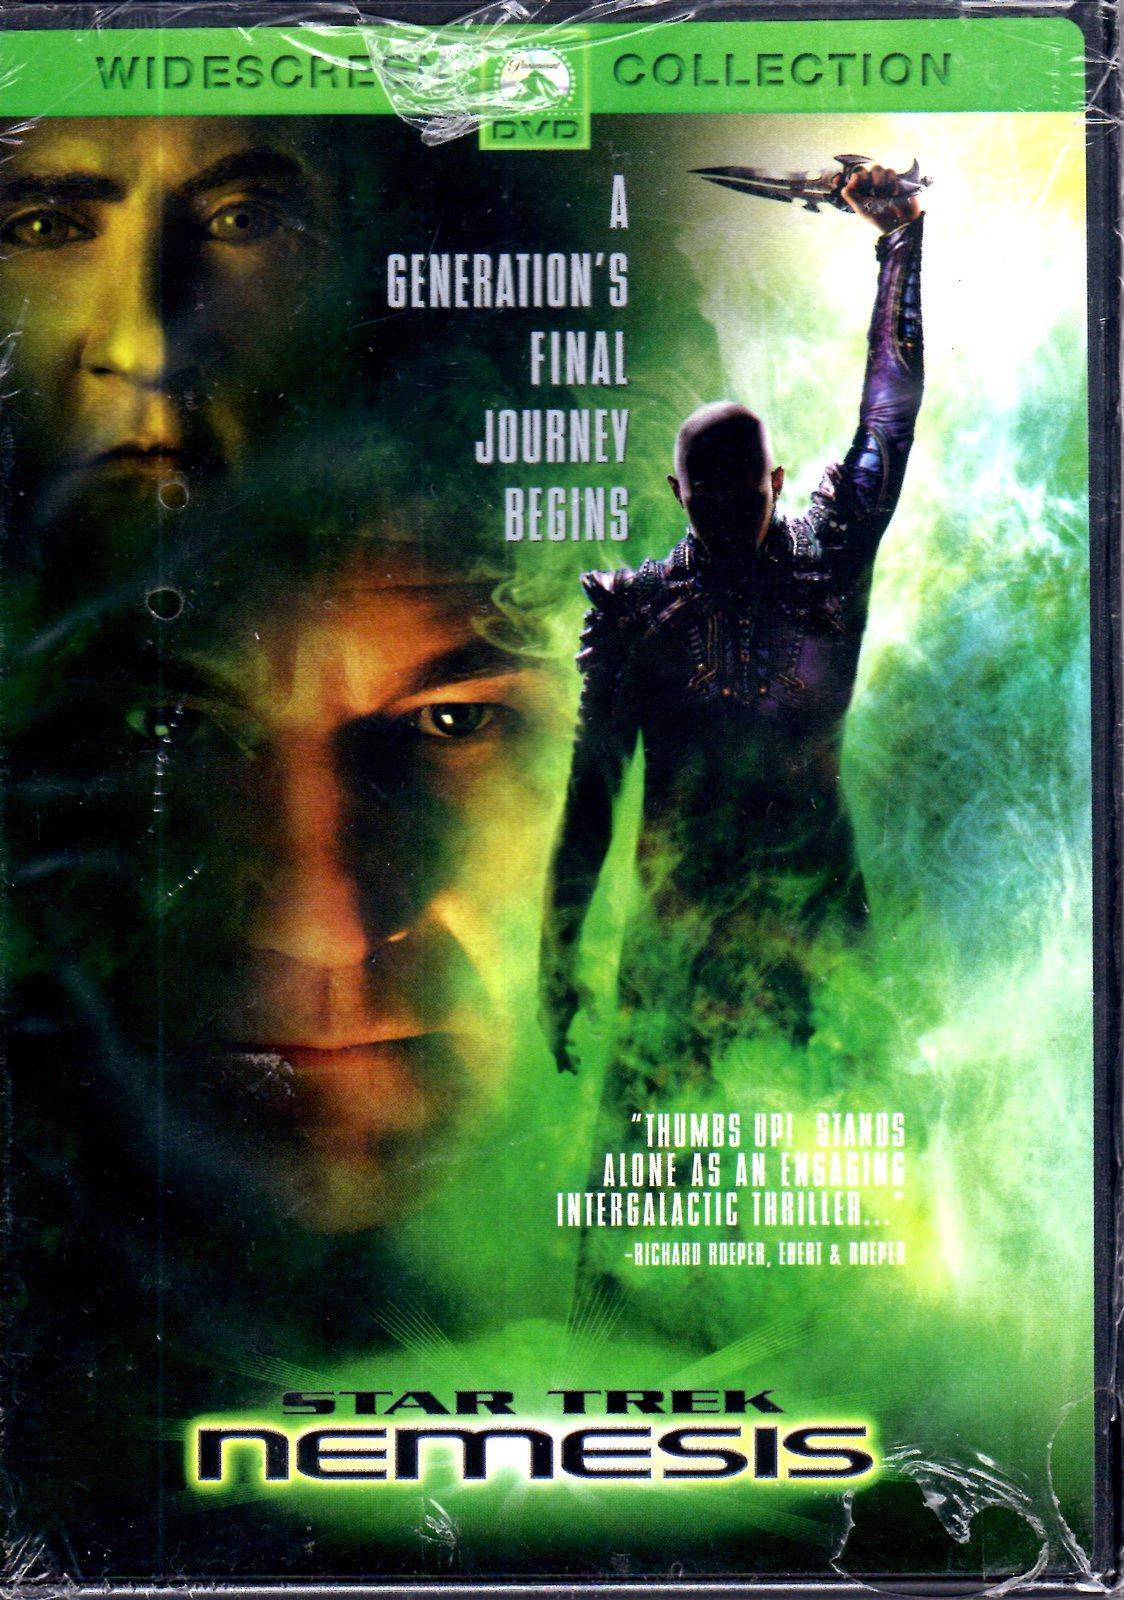 DVD - Star Trek Nemesis